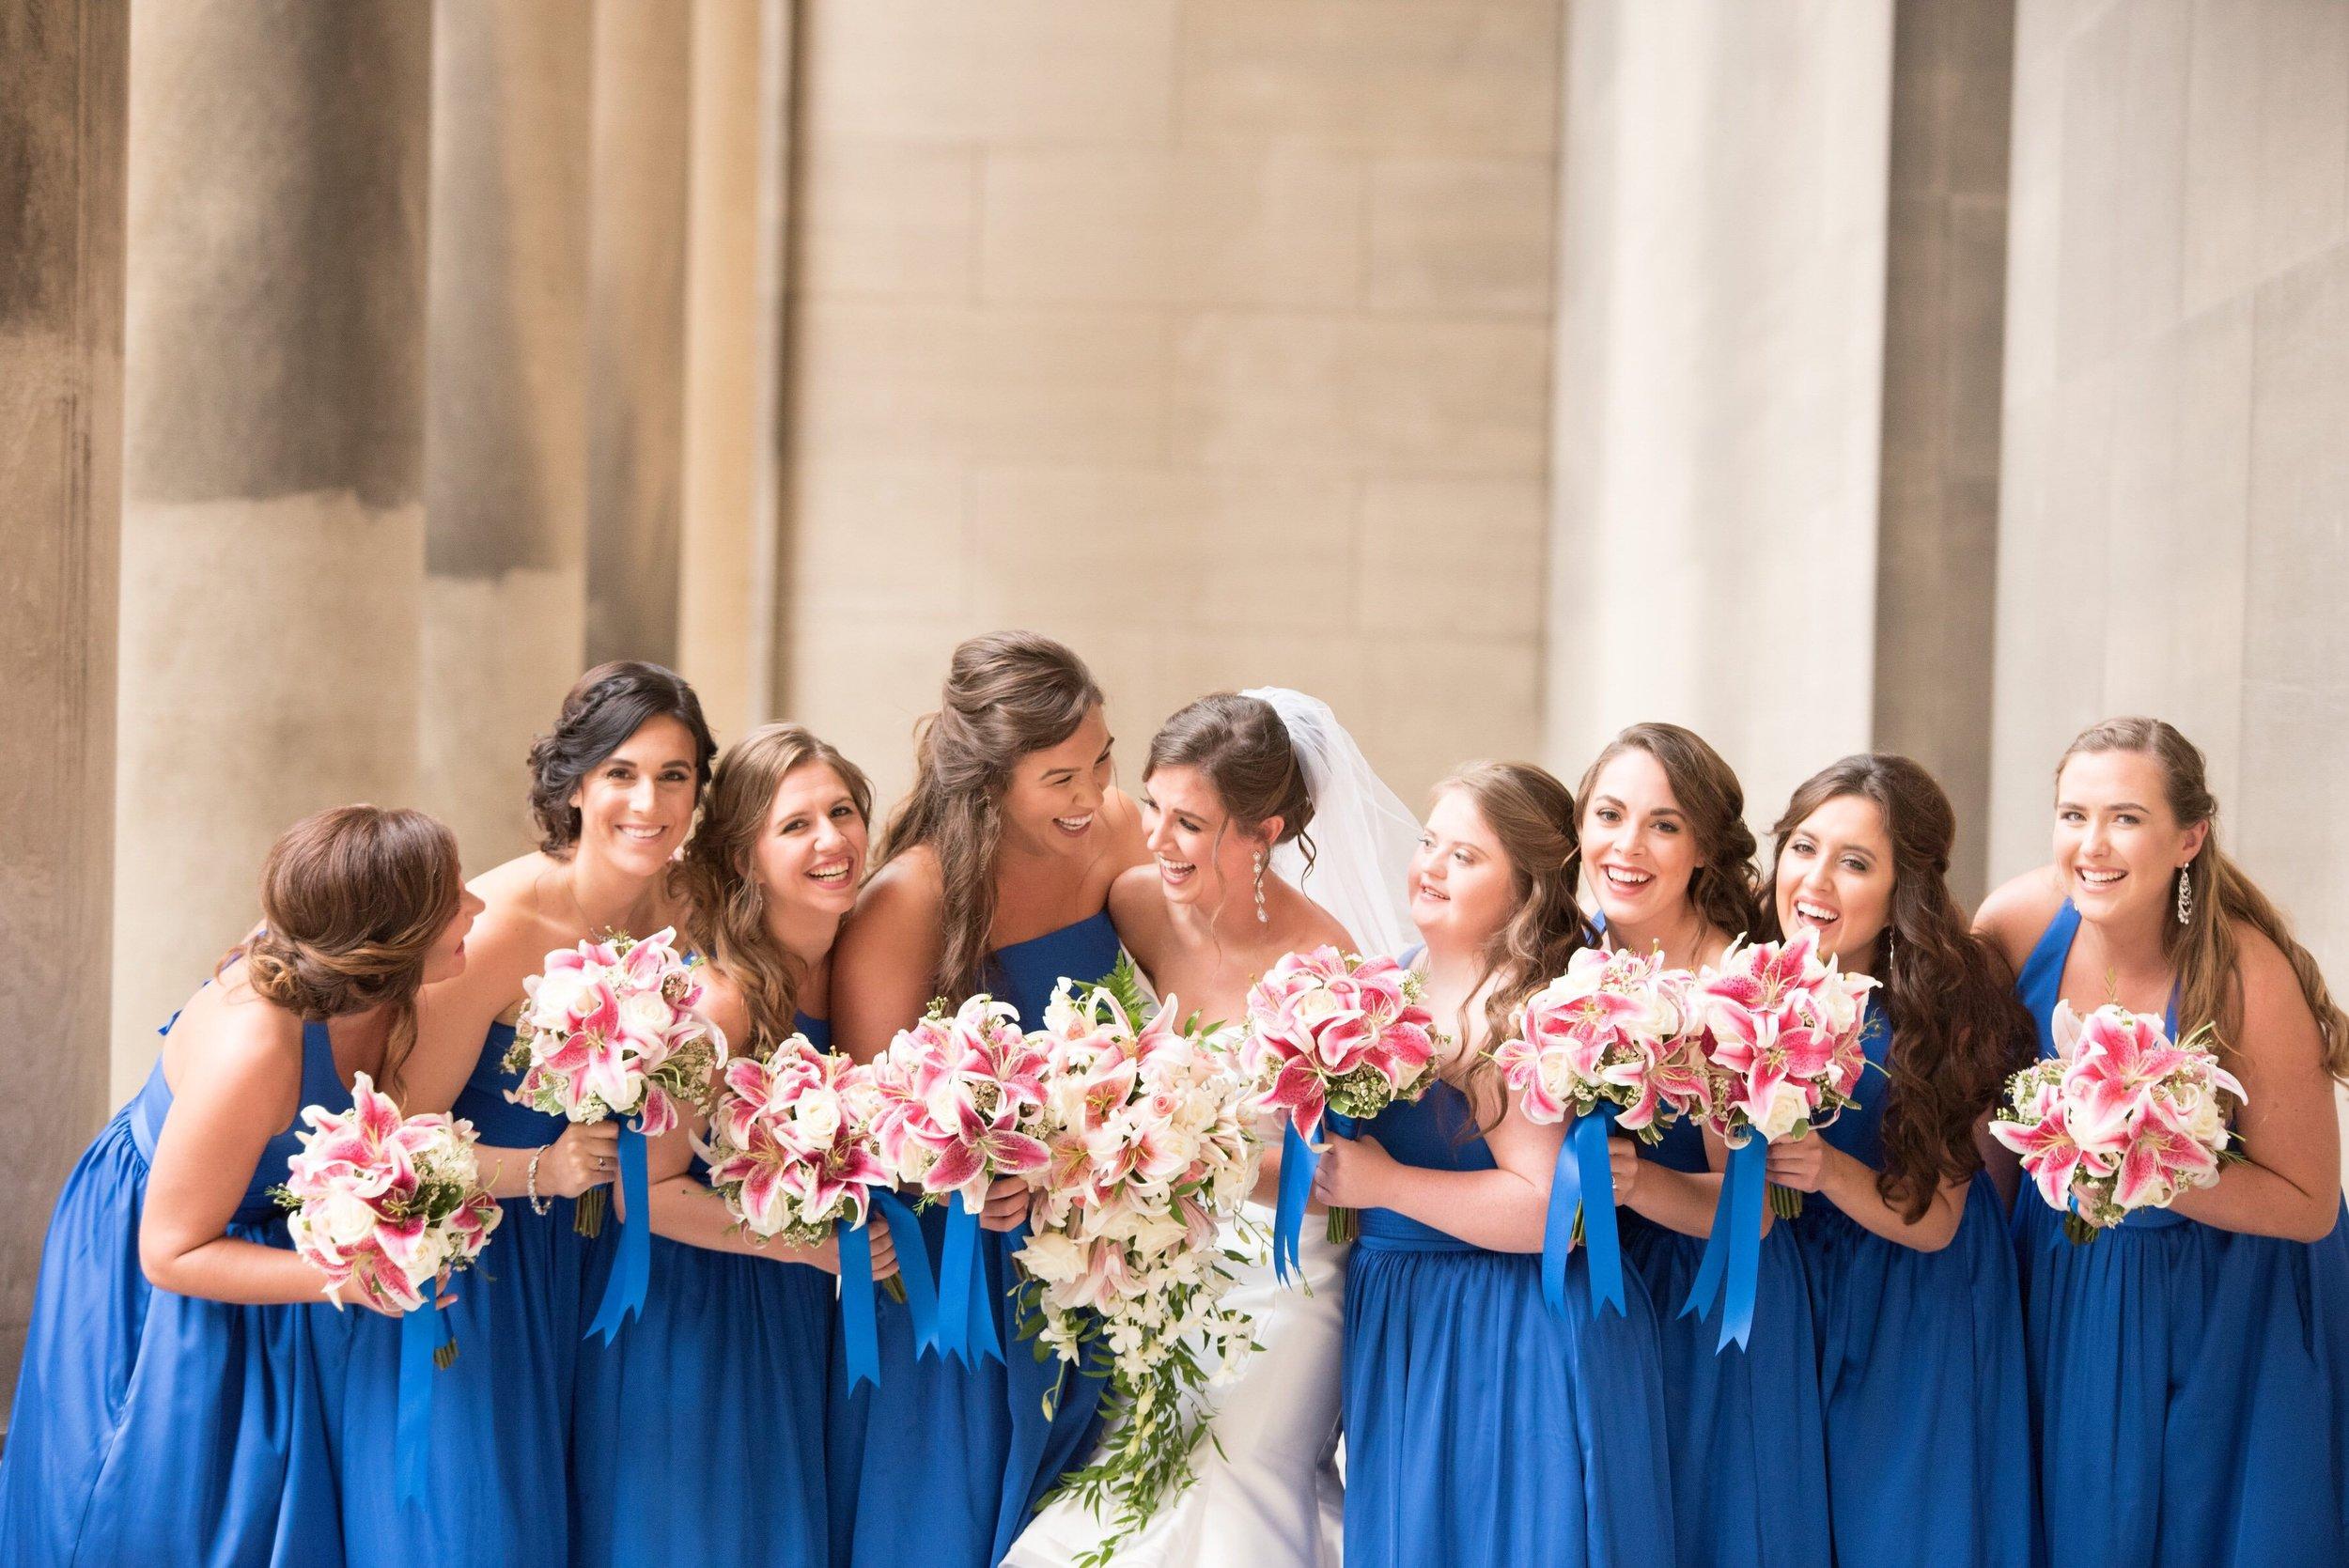 adult-bride-bridesmaids-1468521.jpg